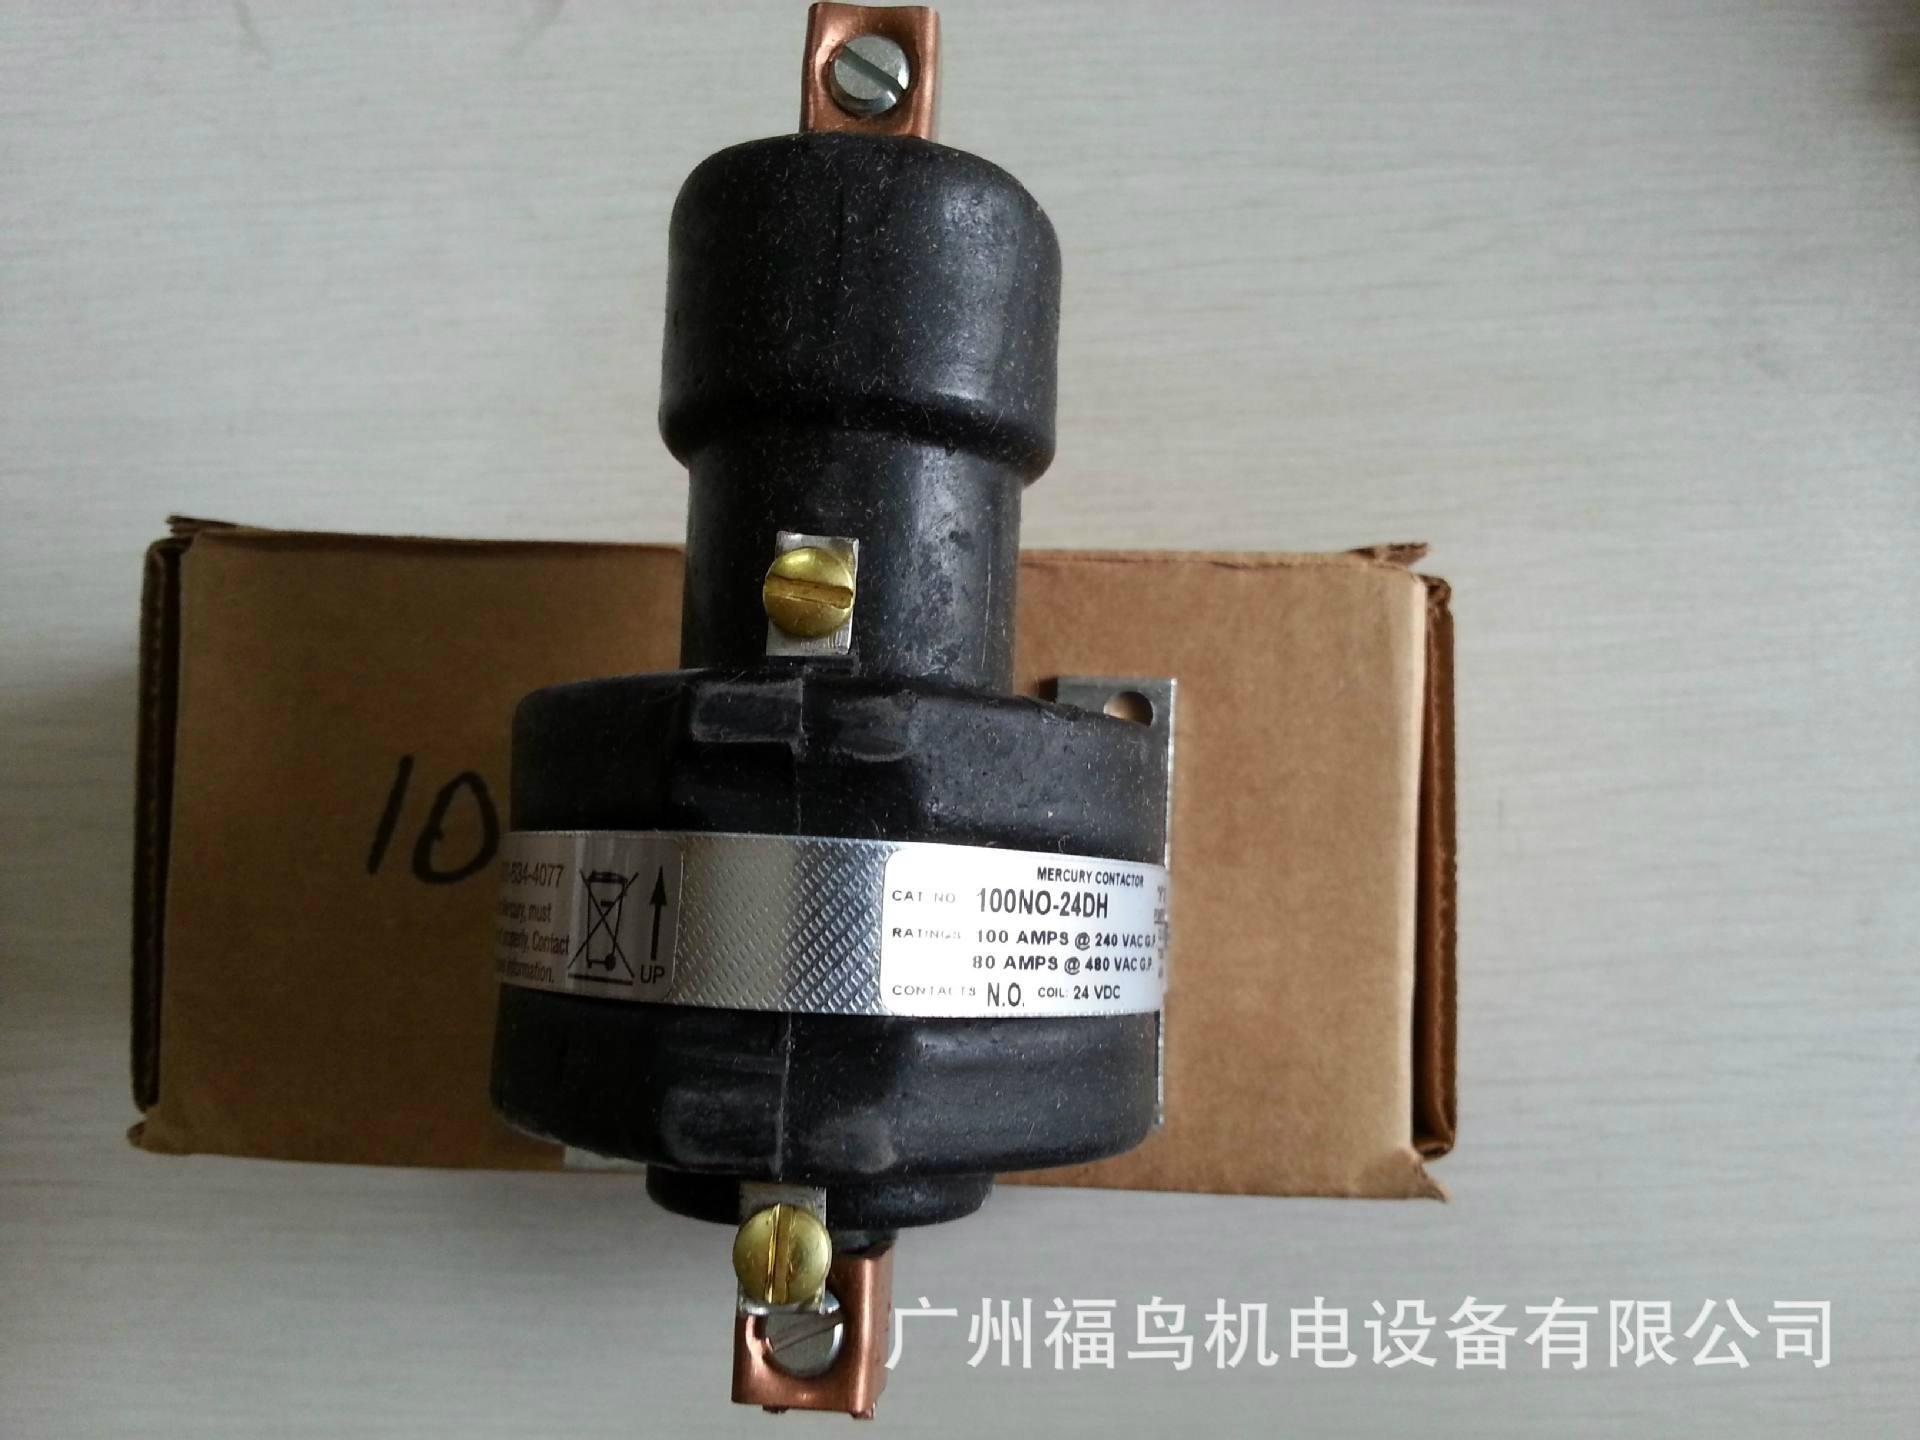 MDI水銀接觸器, 型號: 100NO-24DH